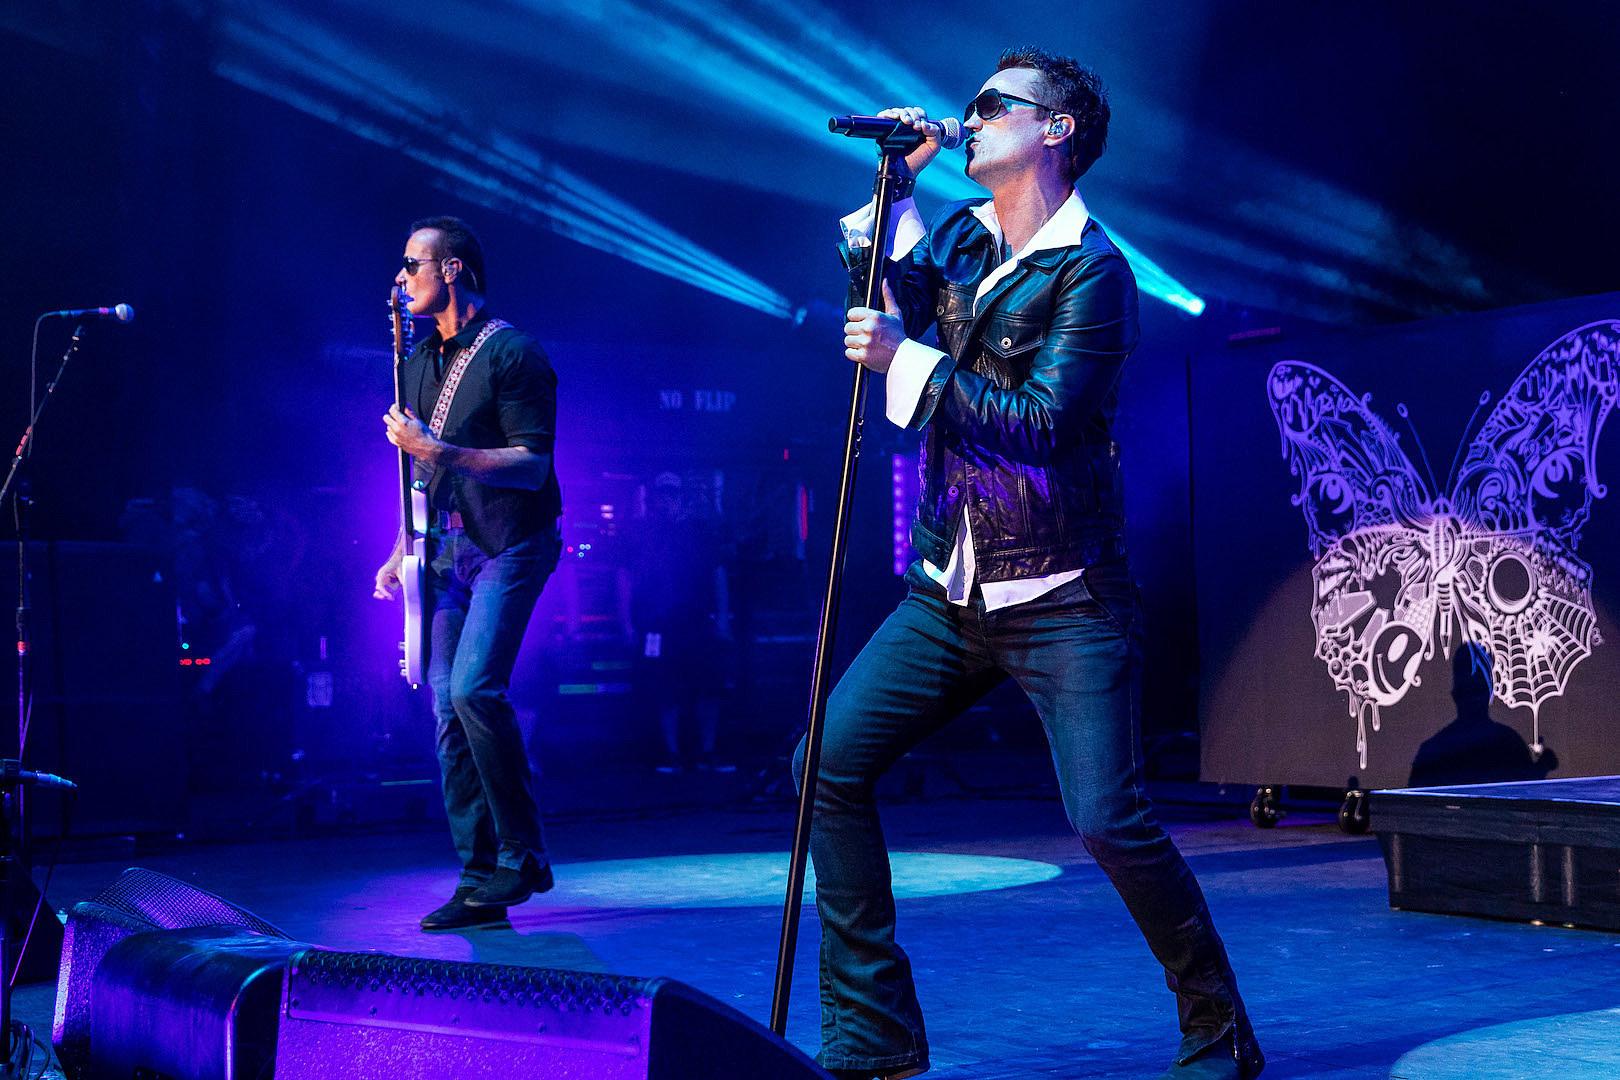 25 Years Ago: Stone Temple Pilots Release 'Purple' Album